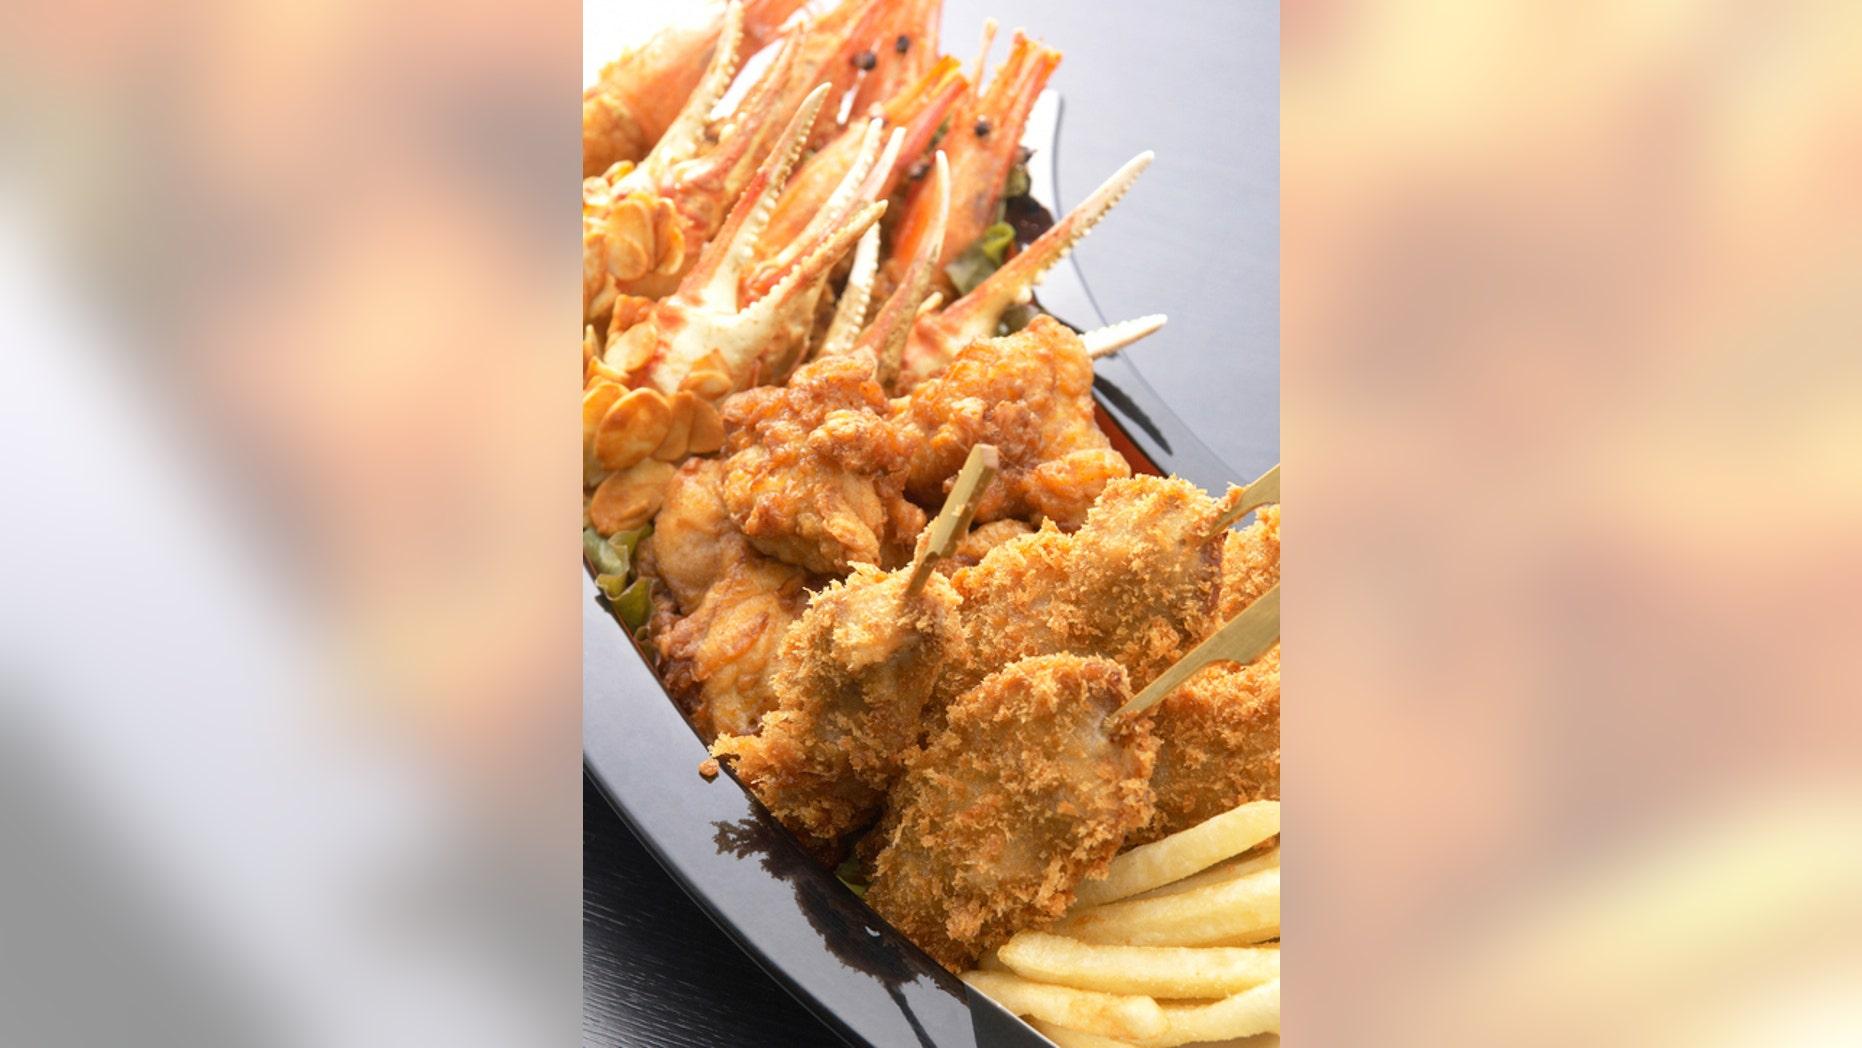 Kushikatsu, deep-fried meat and vegetable skewers, are a very popular street food in Japan.